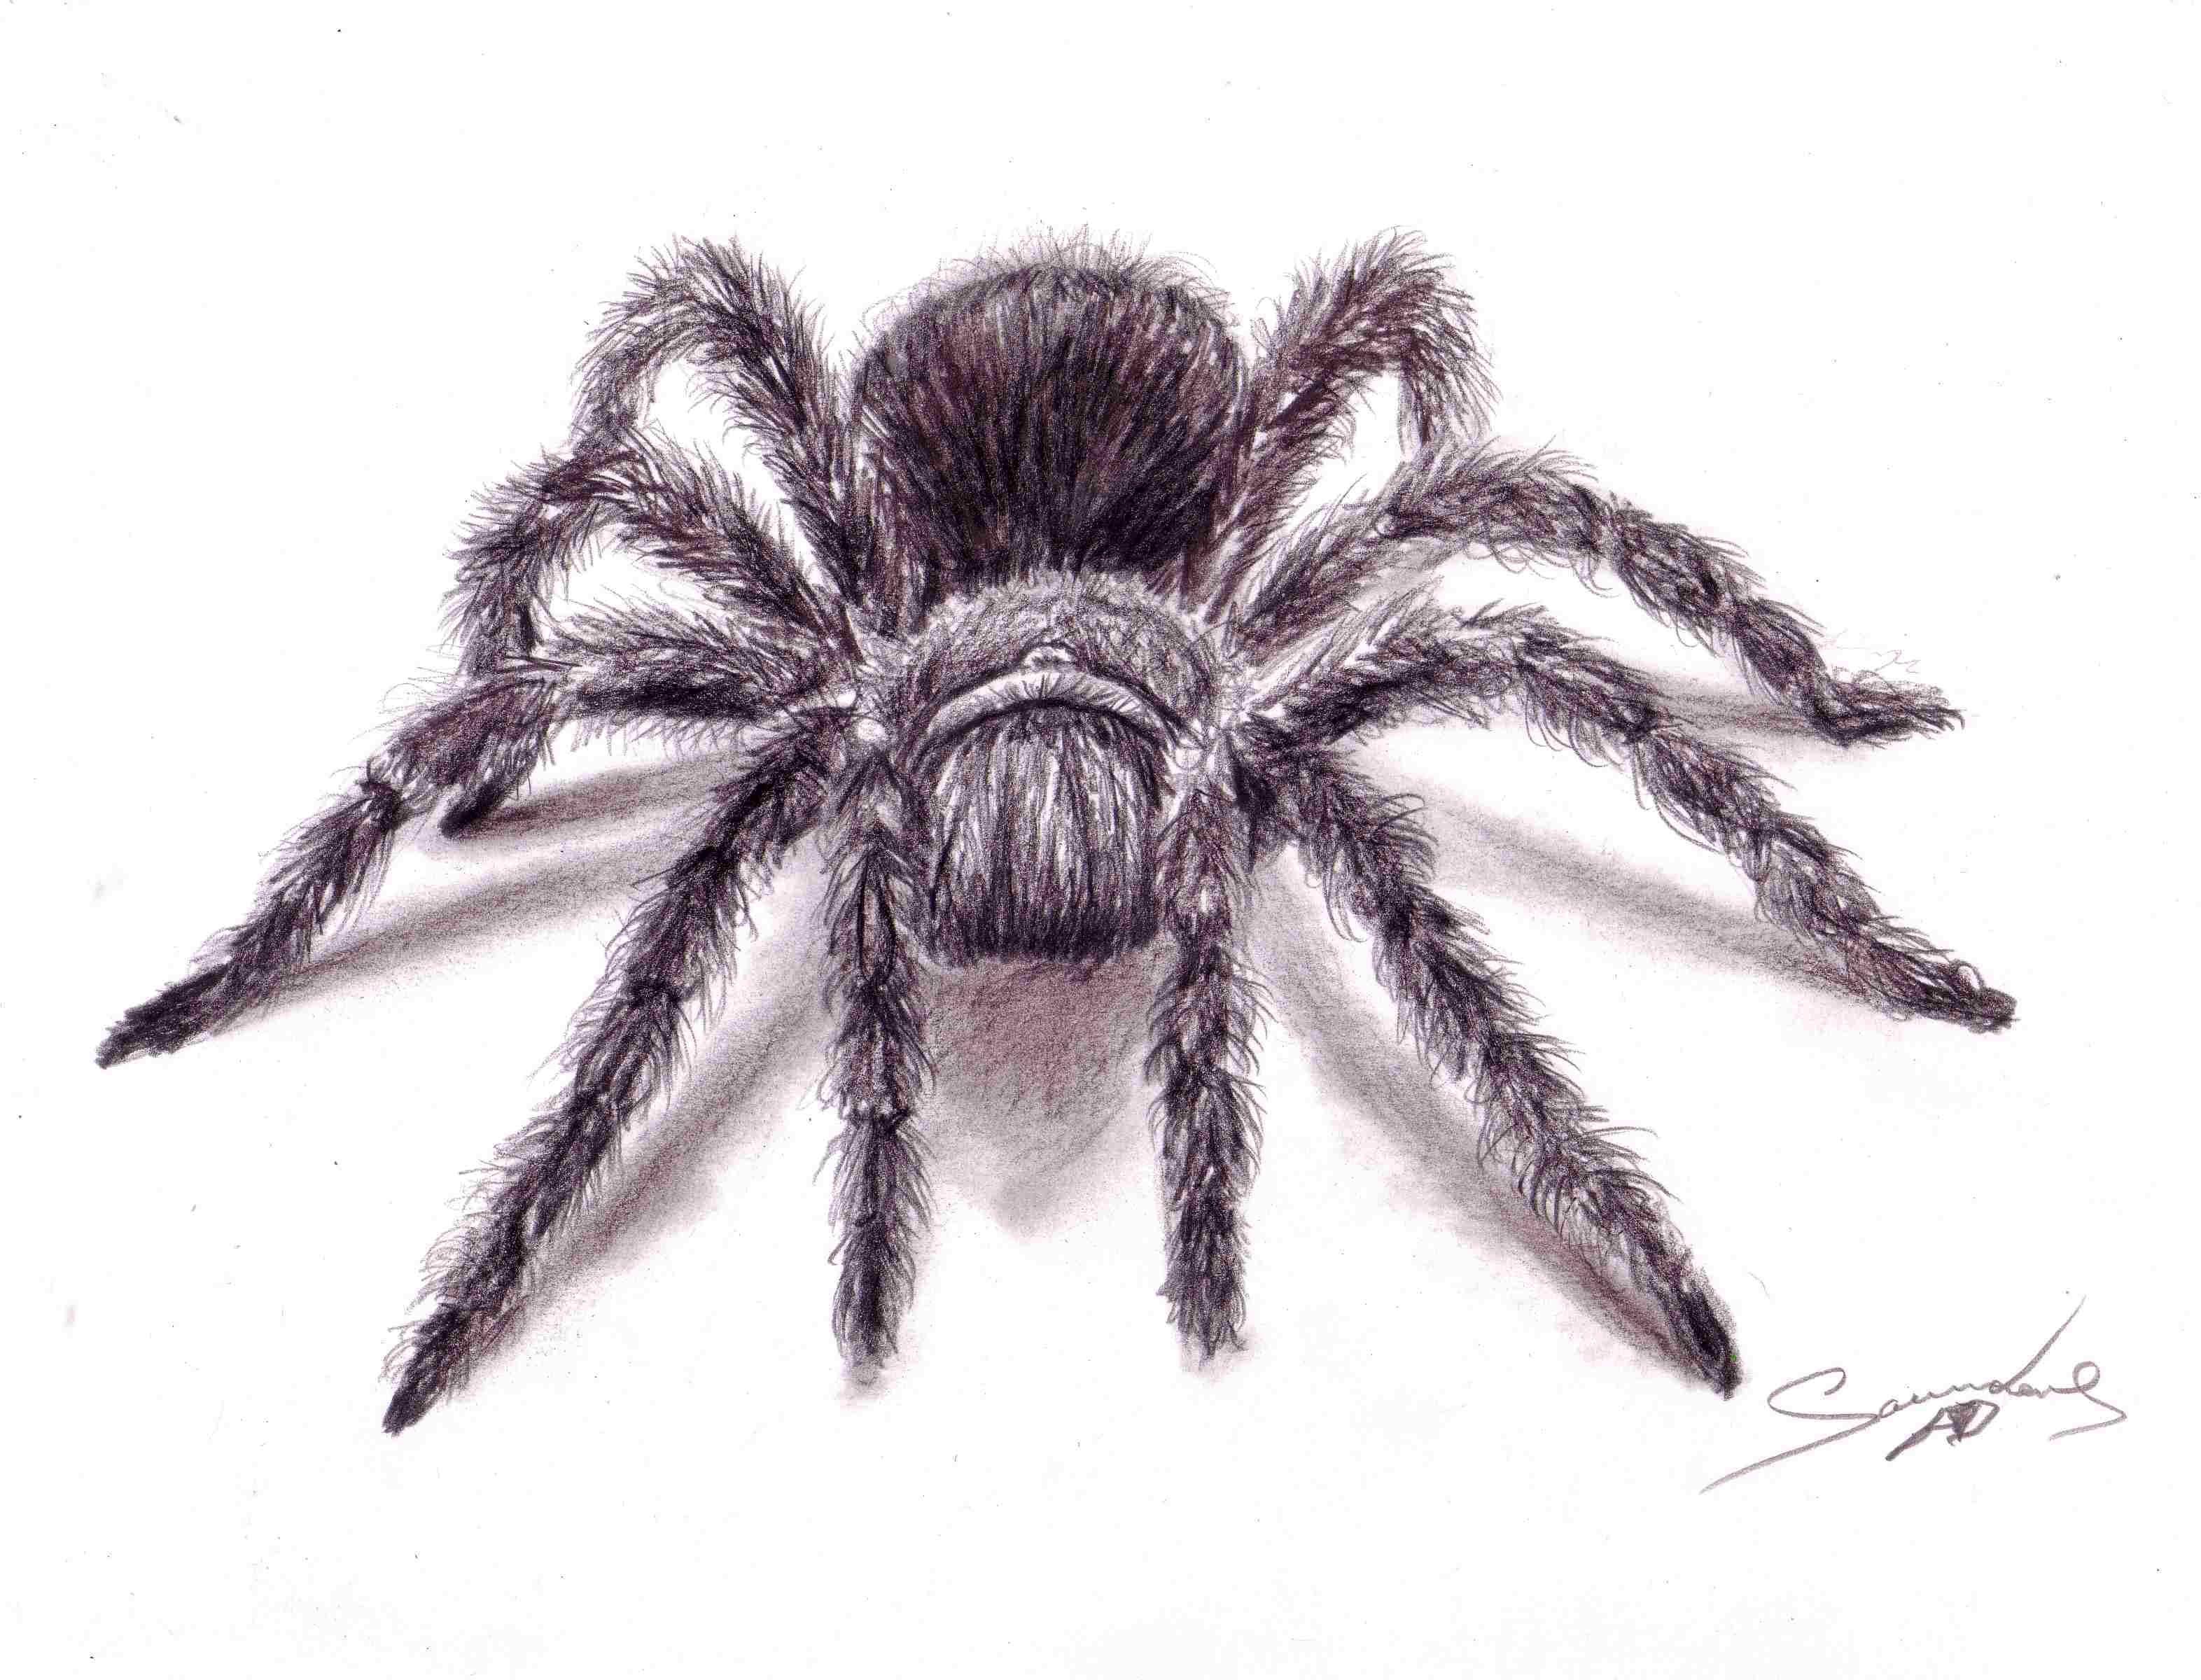 Drawn spider tarantula YouTube Drawing: Time Time Tarantula